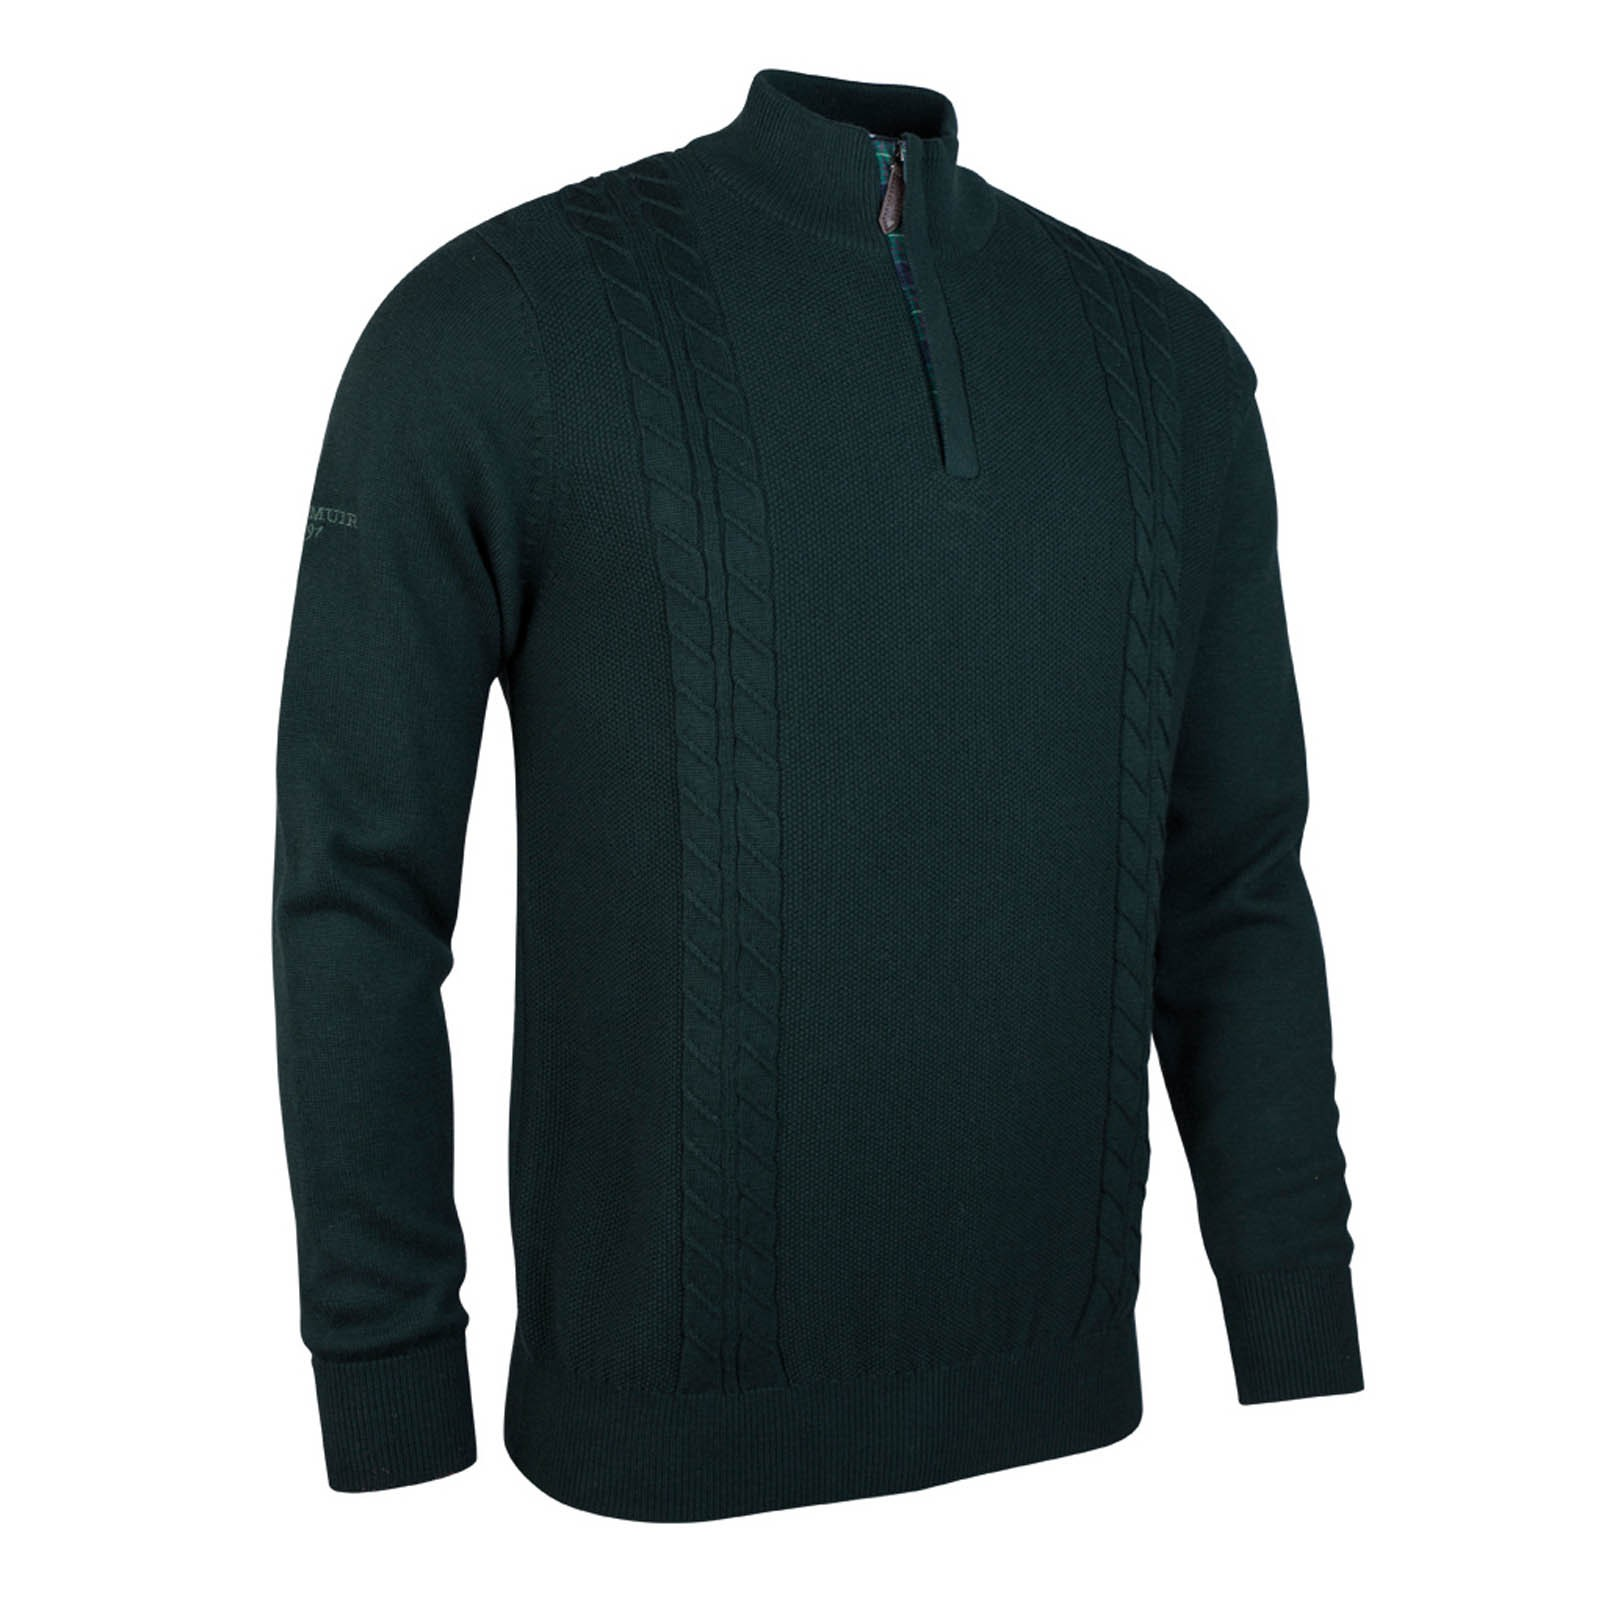 Glenmuir Galloway 1/4 Zip Sweaters